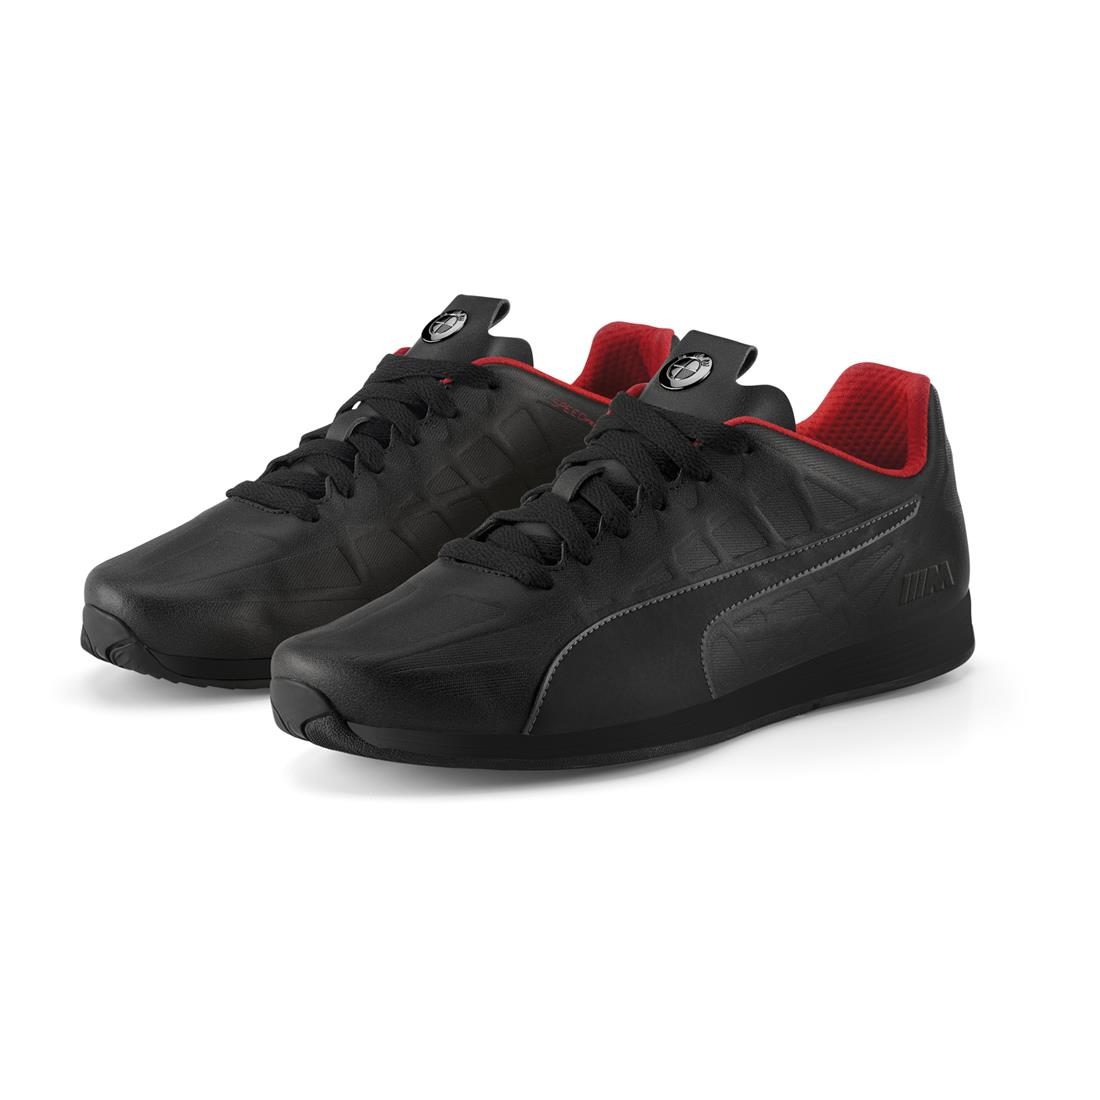 BMW Men's M Evo Speed Shoes